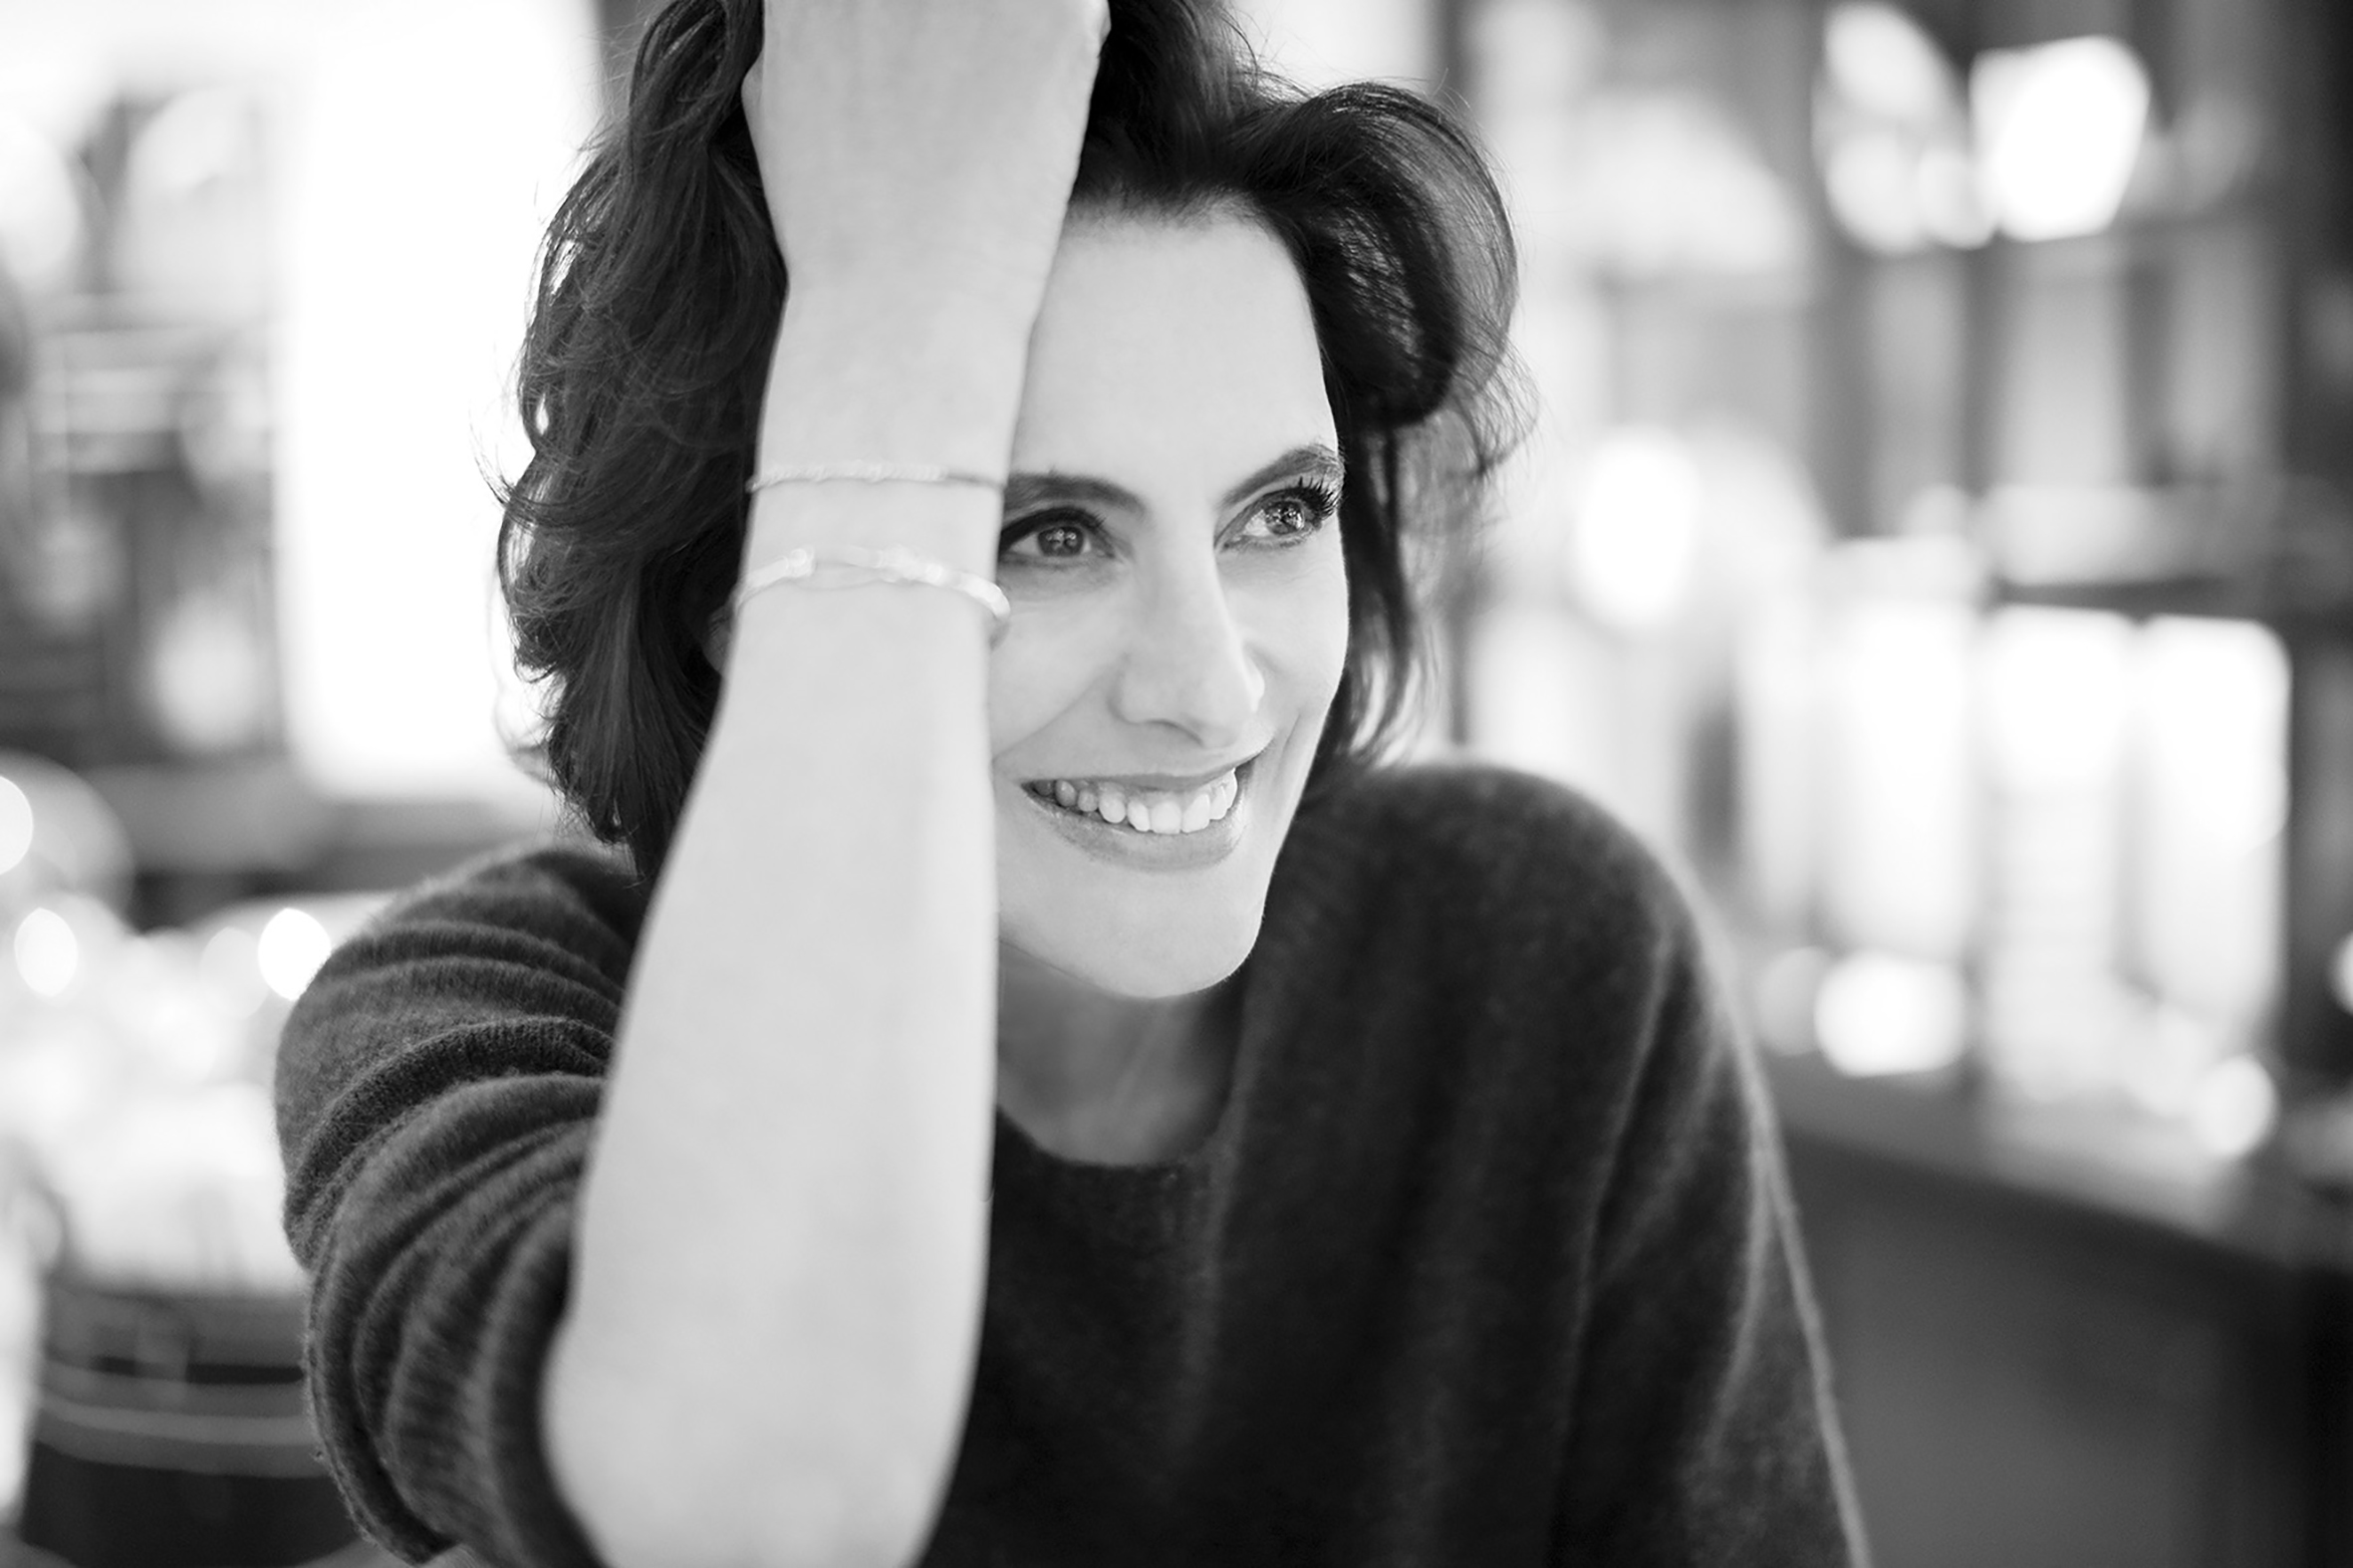 Ines De La Fressange (Foto di Alessandra D'Urso)